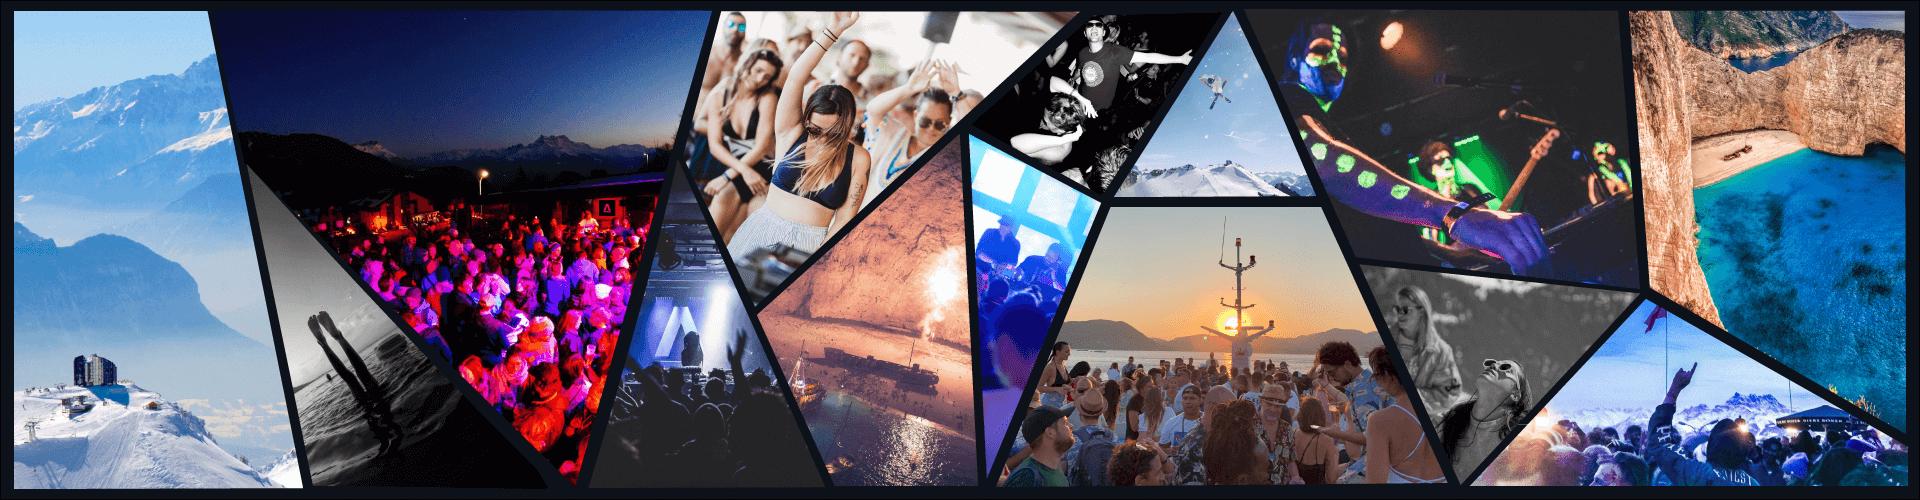 Shapes Festival